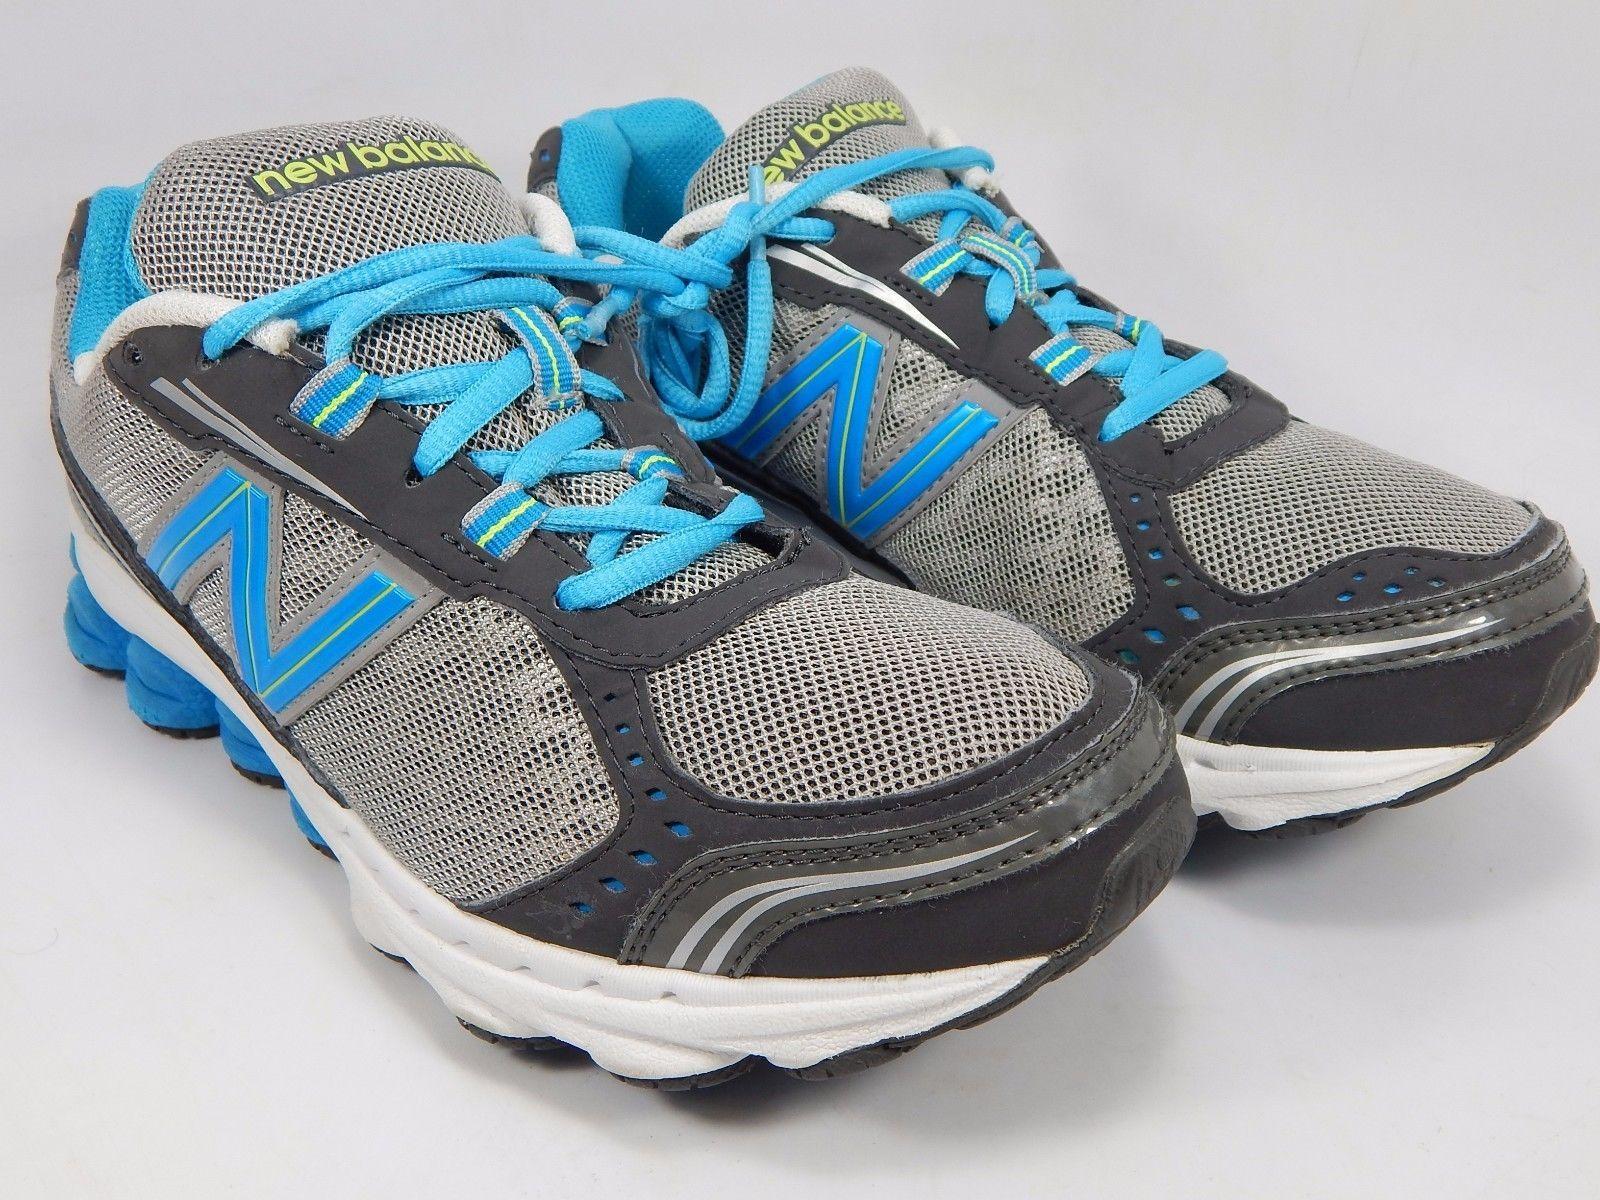 New Balance 1150 v1 Women's Running Shoes Size US 7.5 M (B) EU 38 Gray W1150BW1